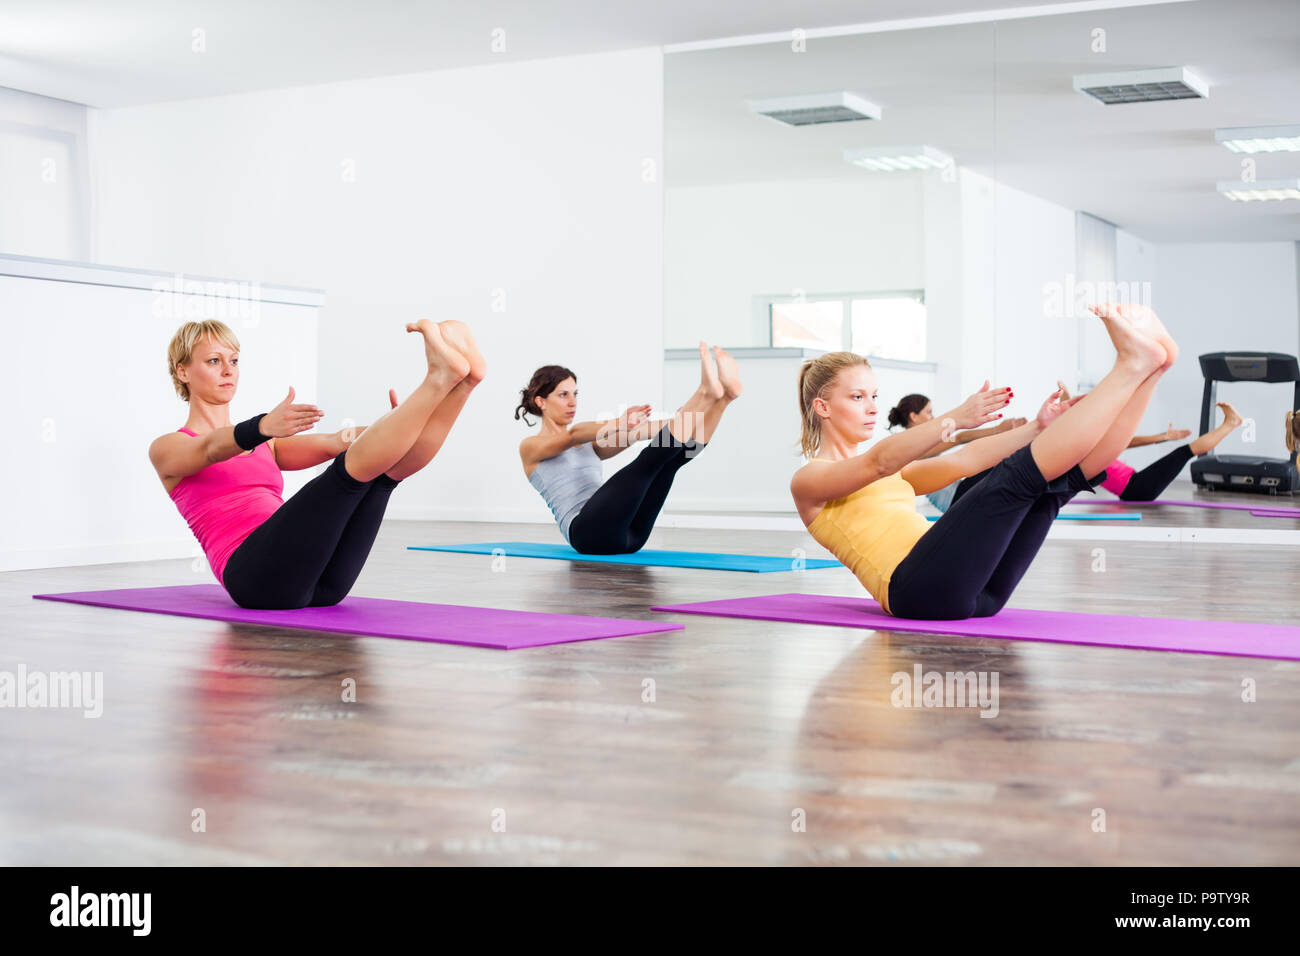 Three girls practicing yoga, Navasana / Boat Pose - Stock Image